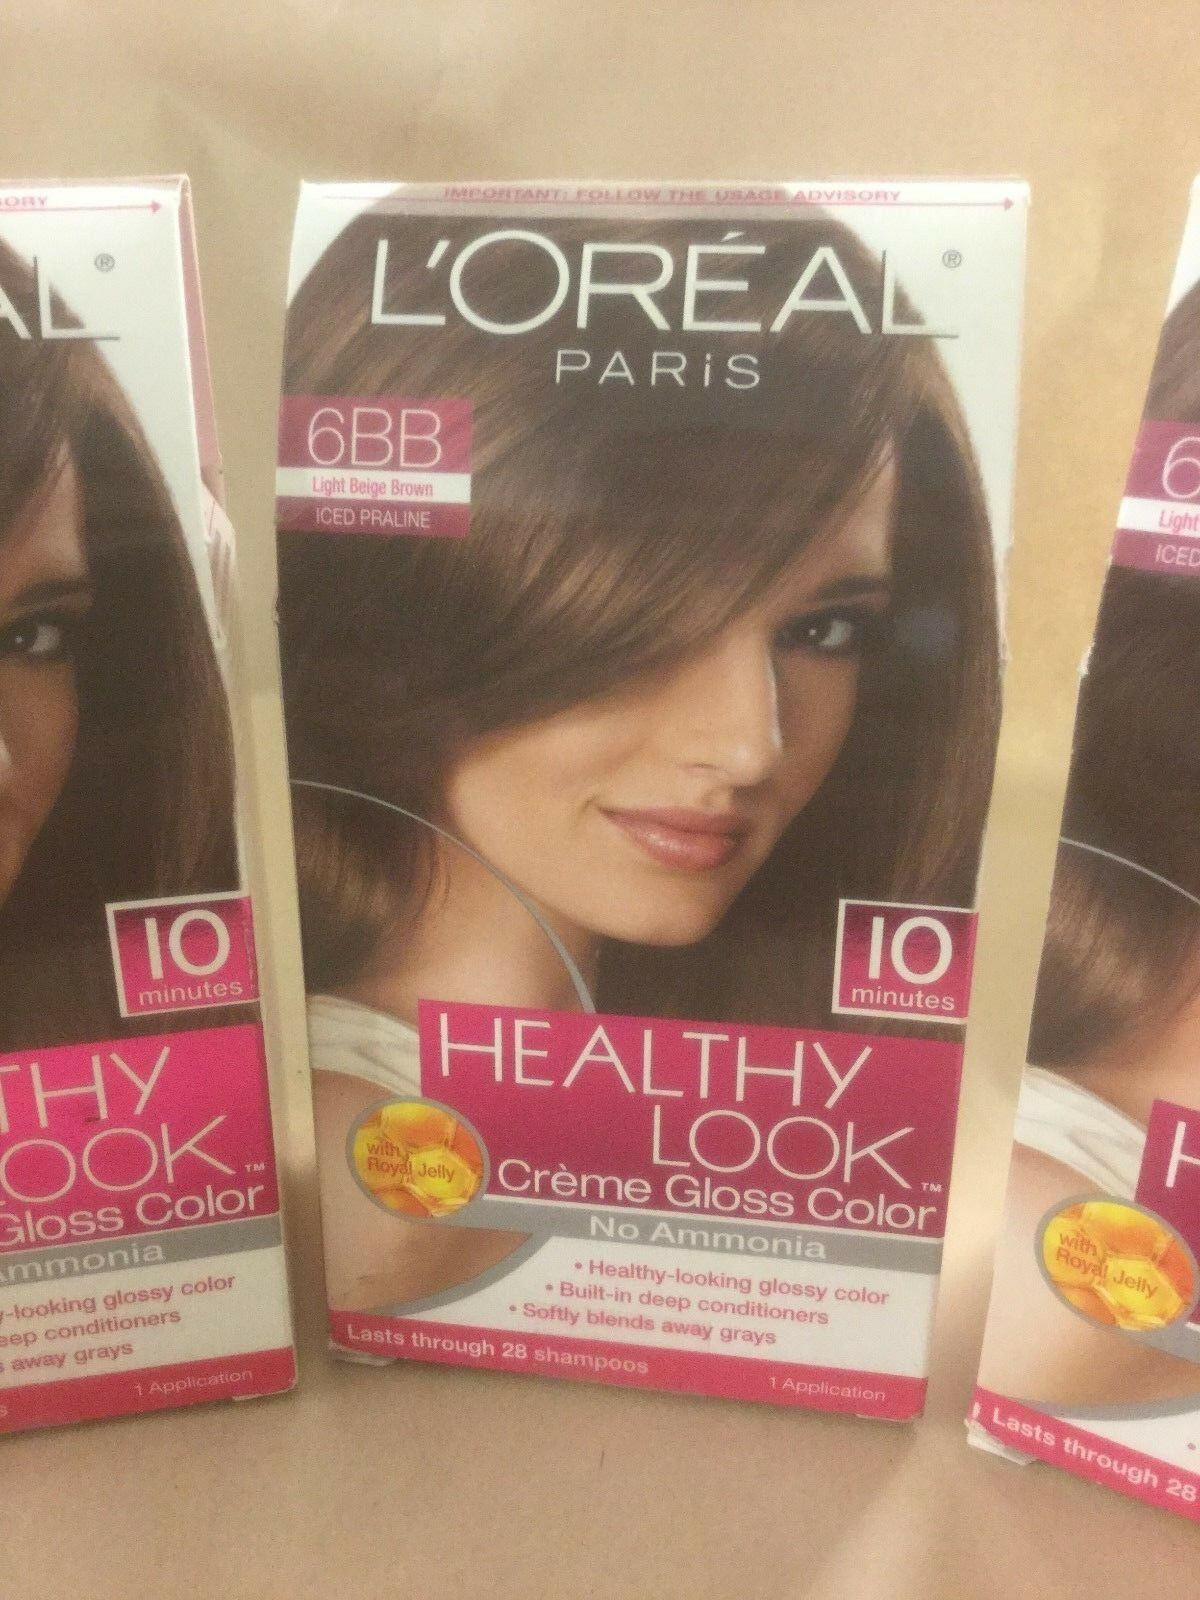 3 X Loreal Healthy Look Hair Color Light Beige Brown Iced Praline